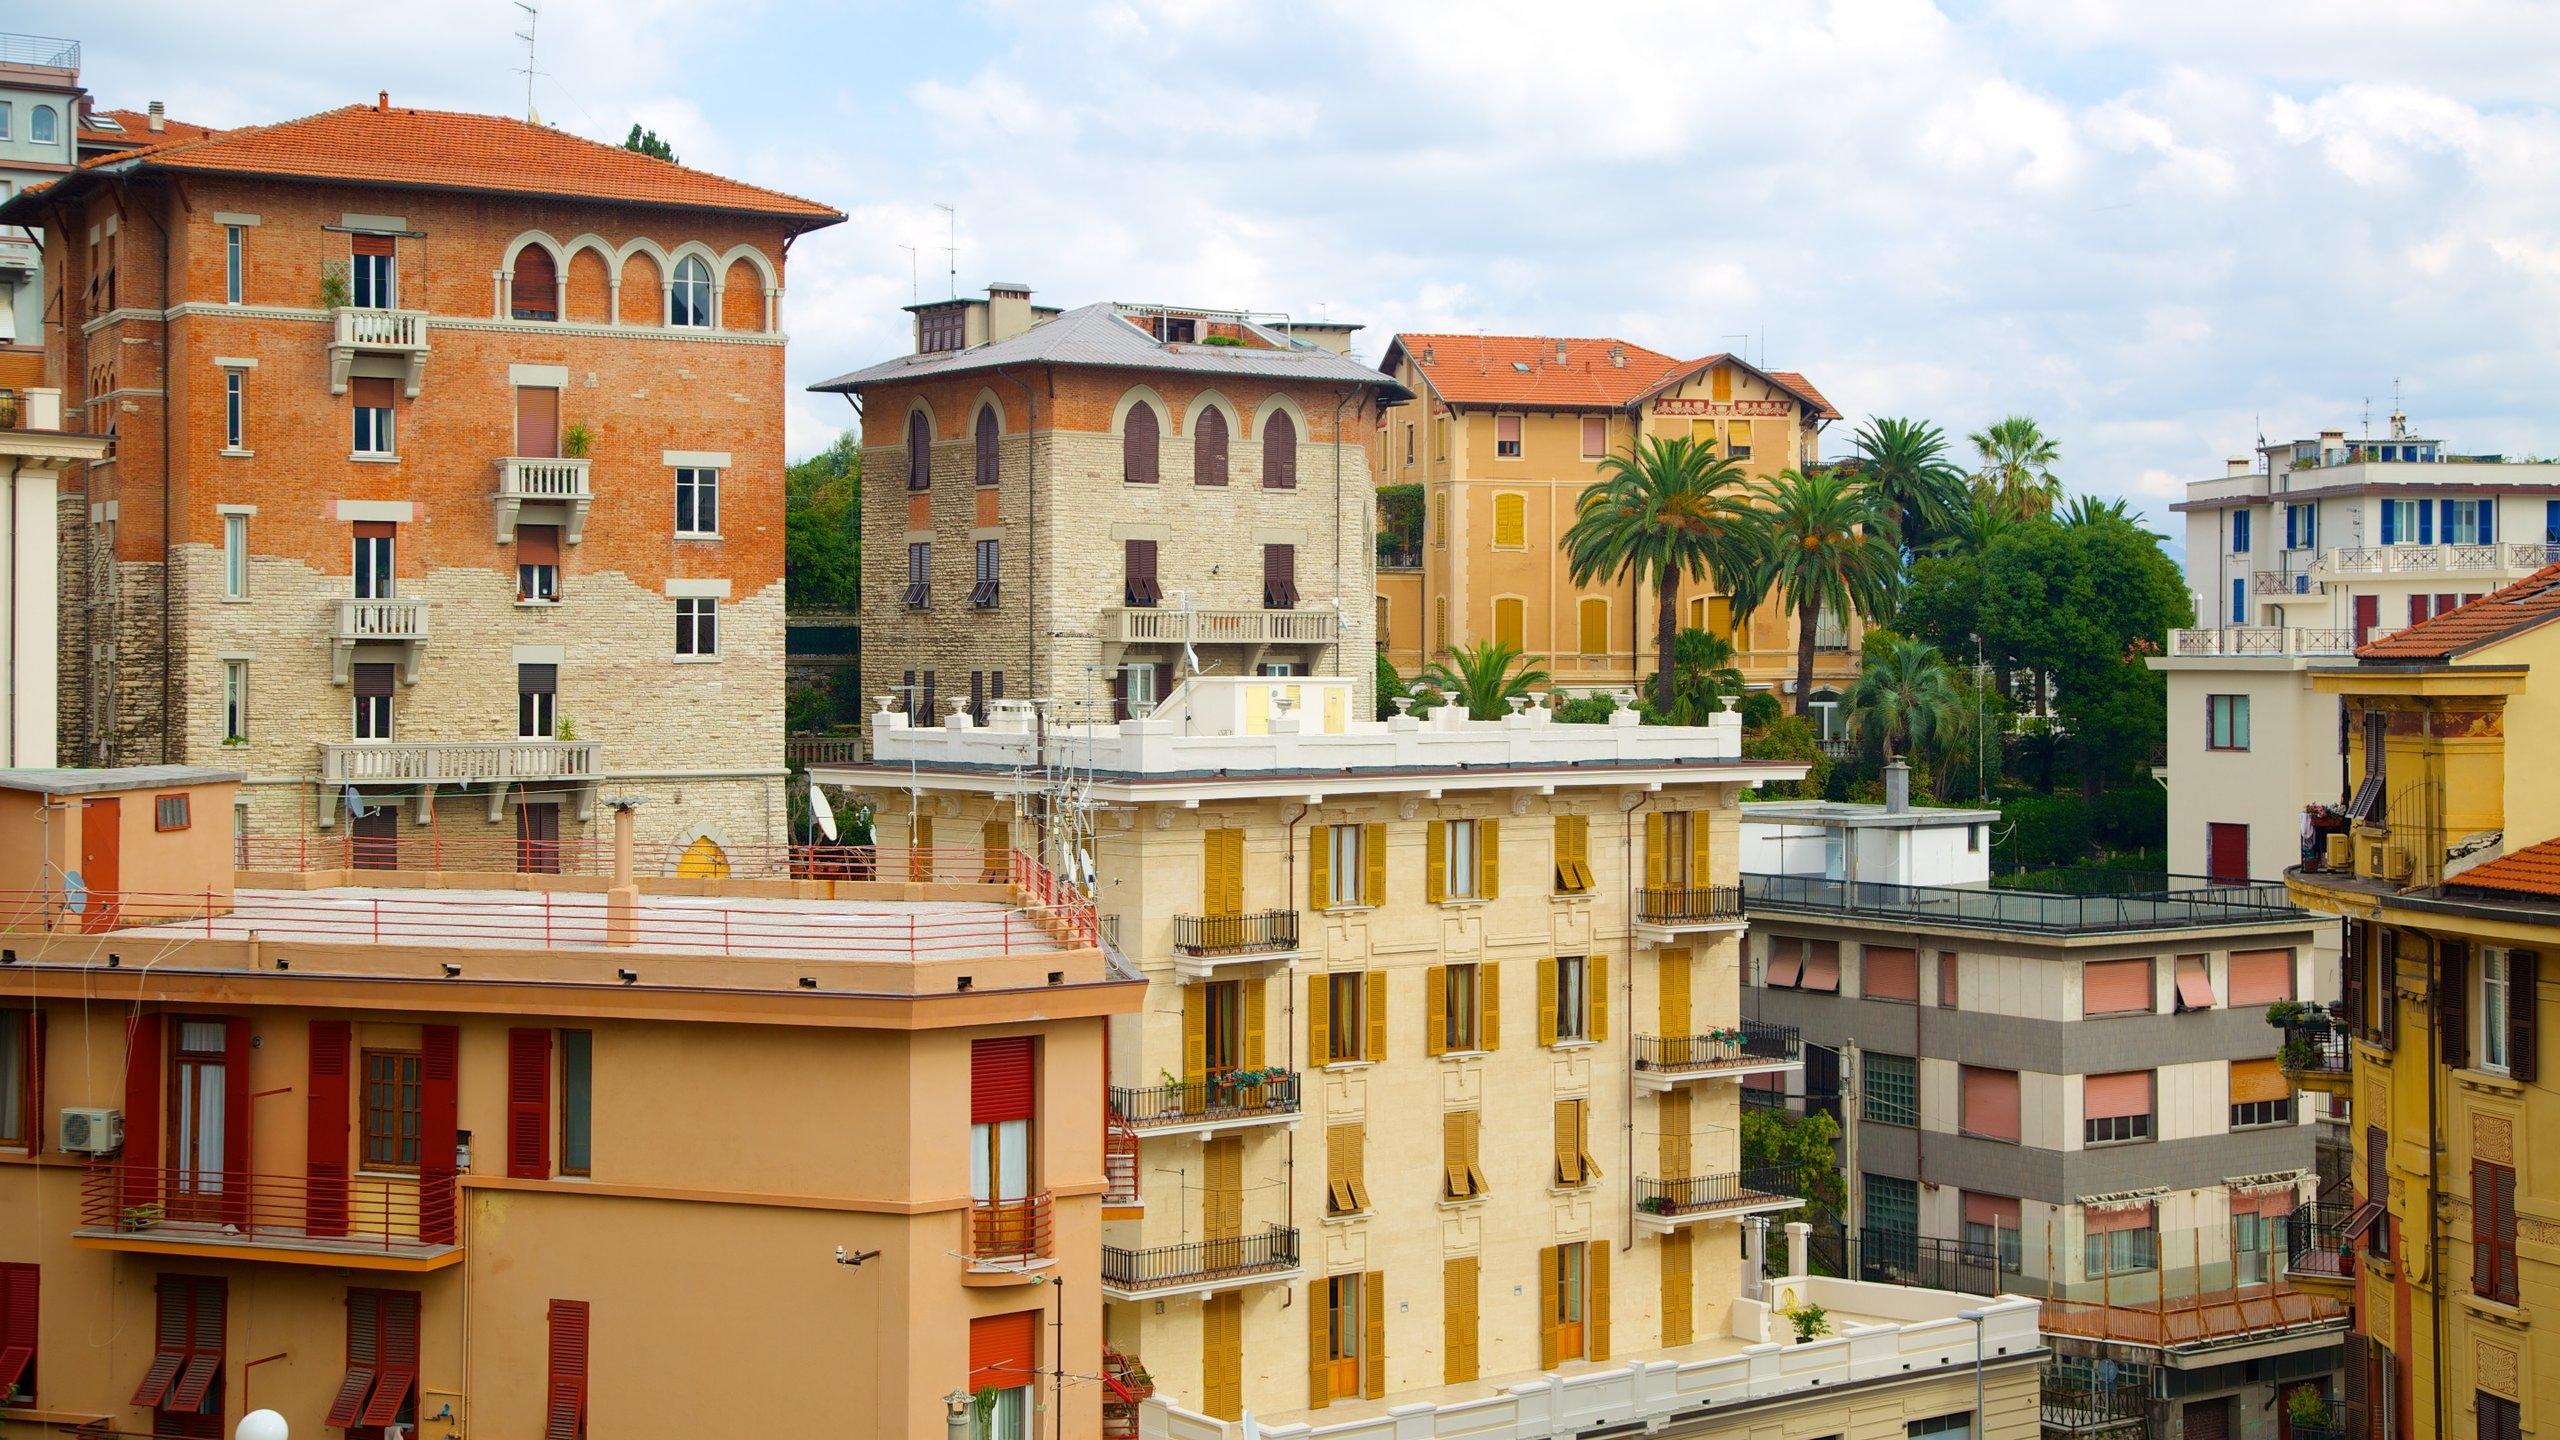 La Spezia Hotels From 44 Cheap Hotel Deals Travelocity